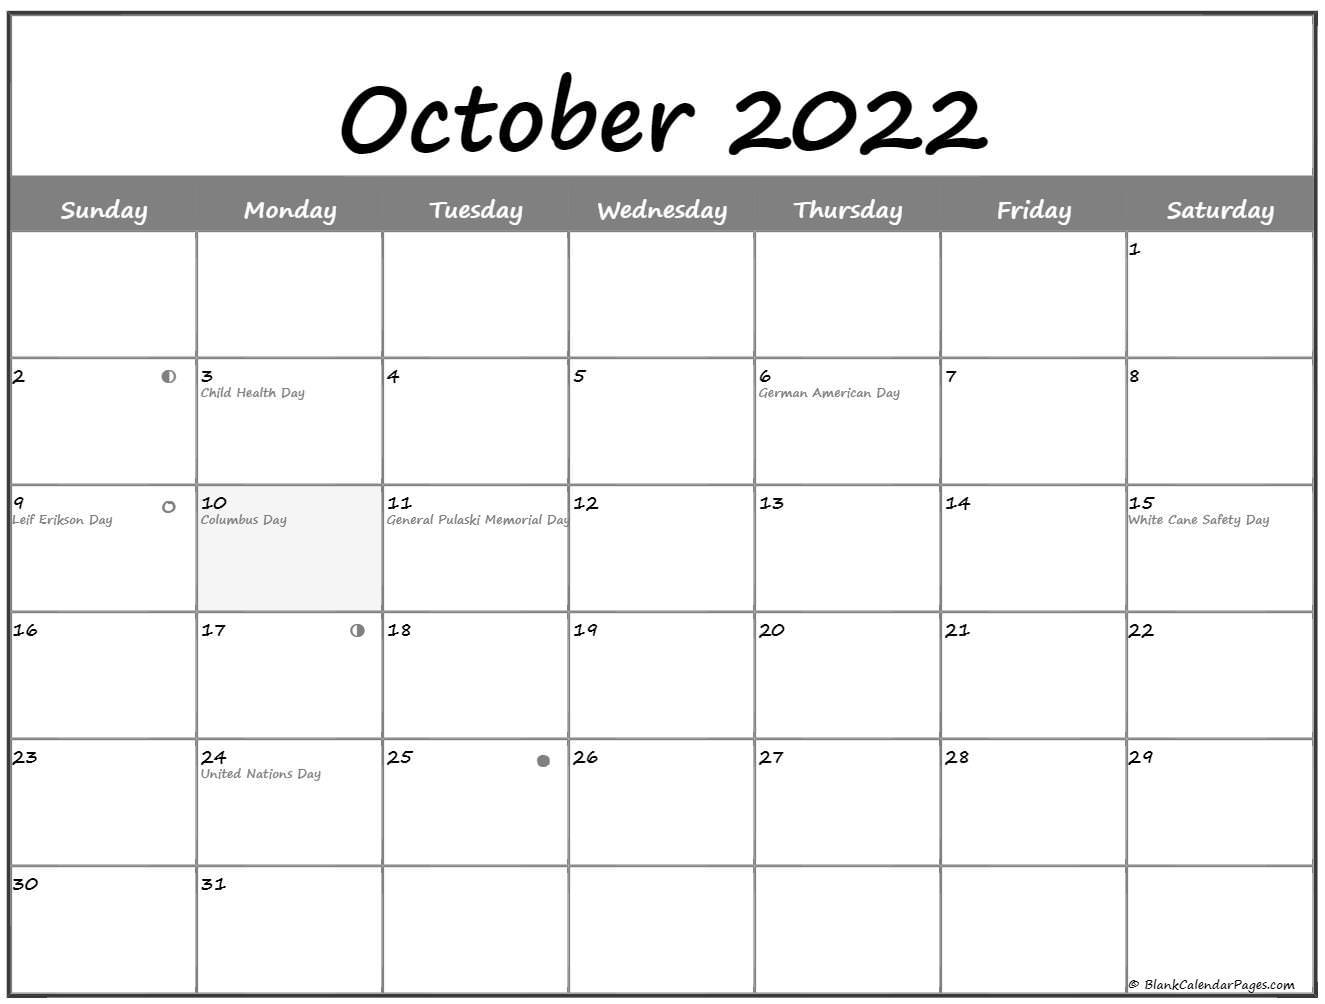 October 2022 Lunar Calendar   Moon Phase Calendar With March April May June Calendar 2022